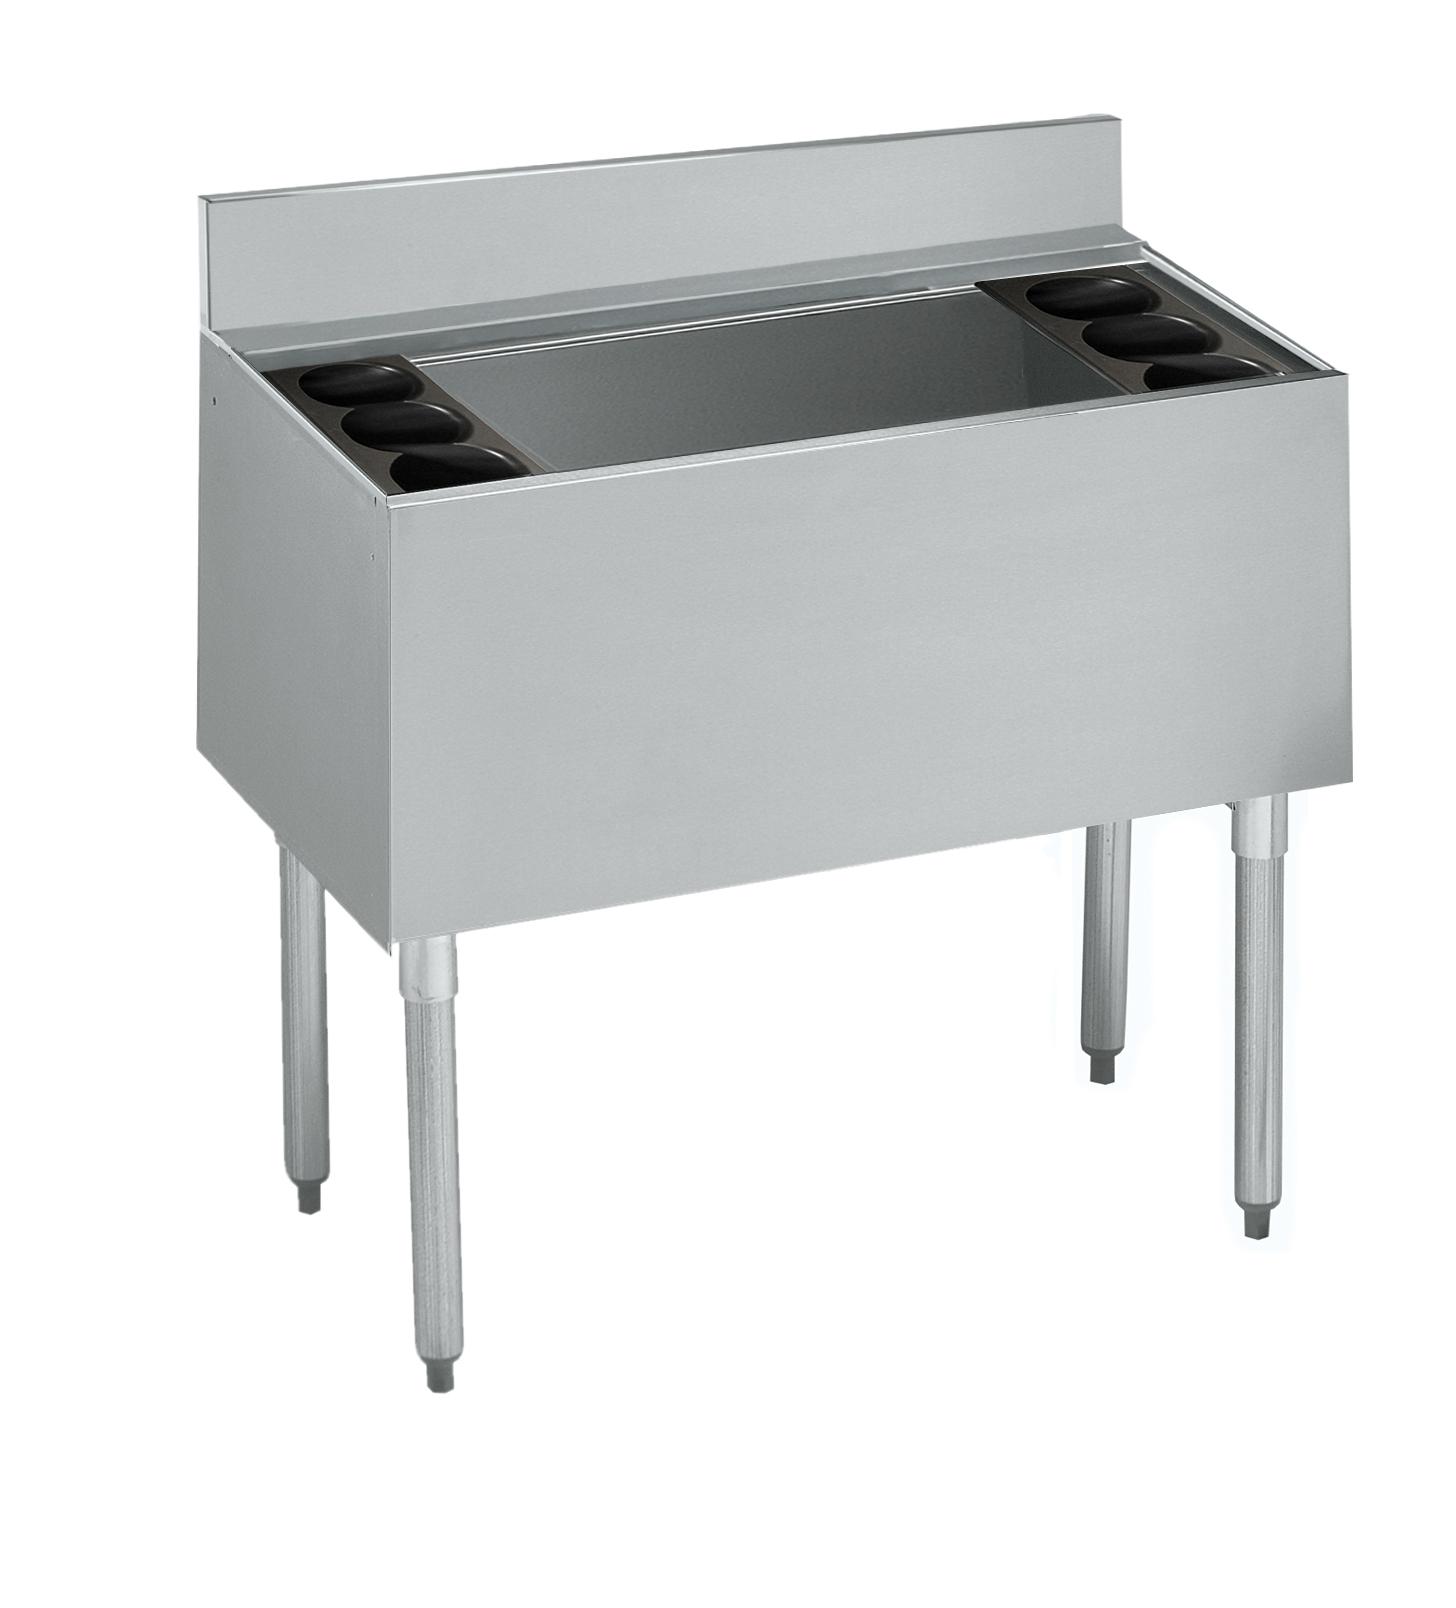 Krowne Metal 21-36DP-7 underbar ice bin/cocktail unit